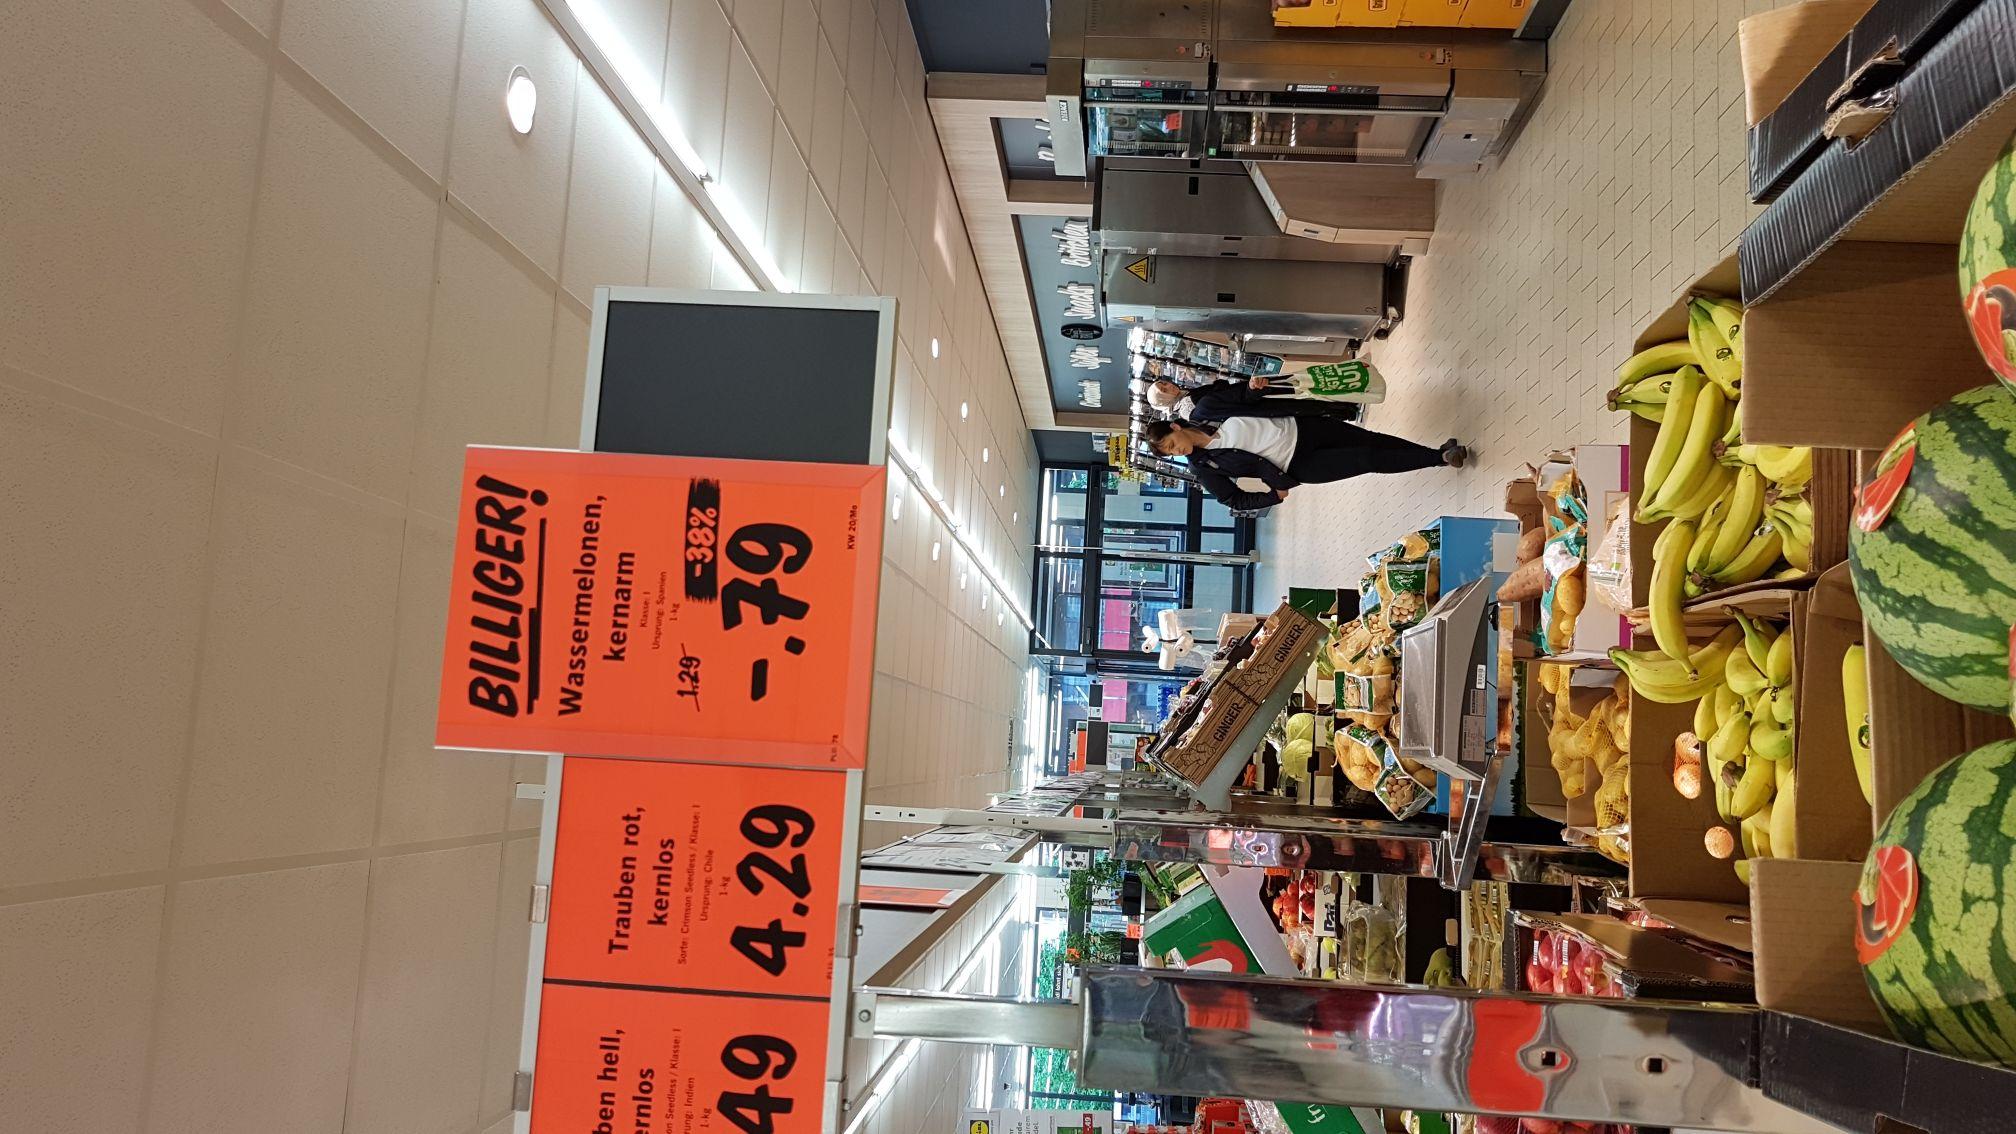 (Lokal)Spanische Wassermelonen kg 0.79€ statt 1.29€ Lidl Bielefeld-Hillegossen